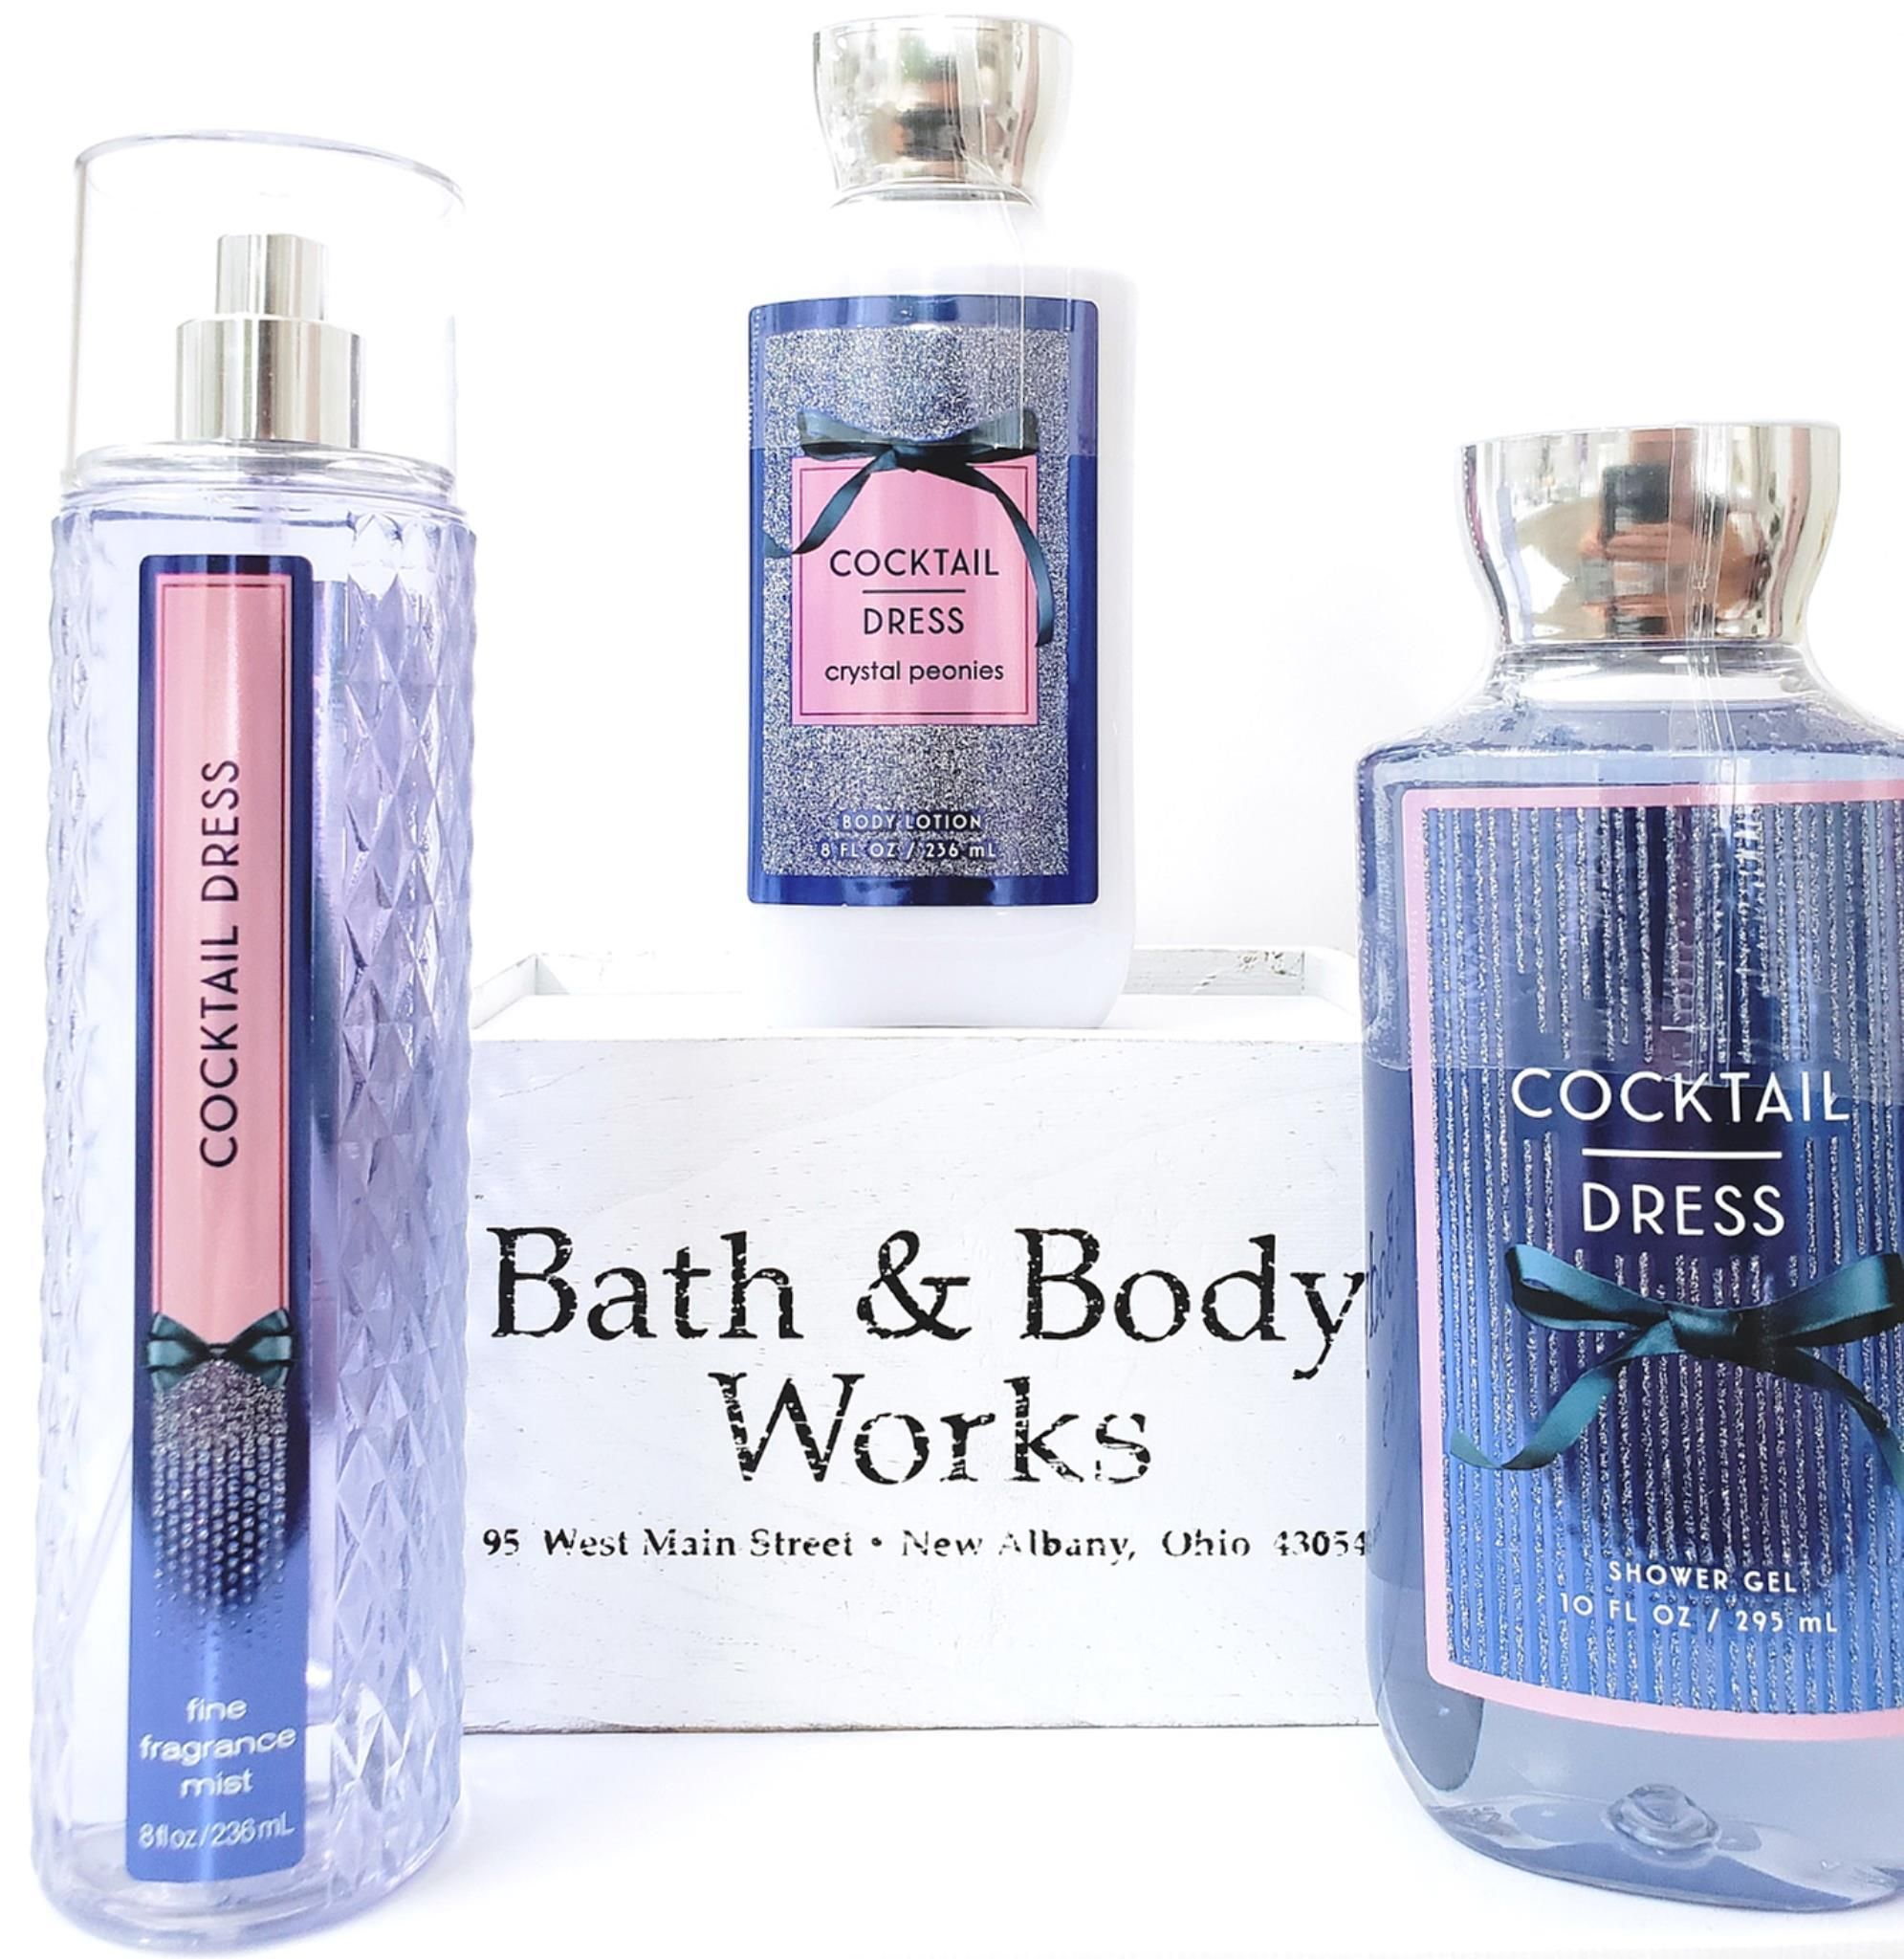 Bath Body Works Cocktail Dress Set Of 3 Body Lotion Fragrance Mist Bath Gel 1 Scents Bath 3 Bath And Body Works Body Spray Gift Bath Body Works Lotion [ 2048 x 1991 Pixel ]